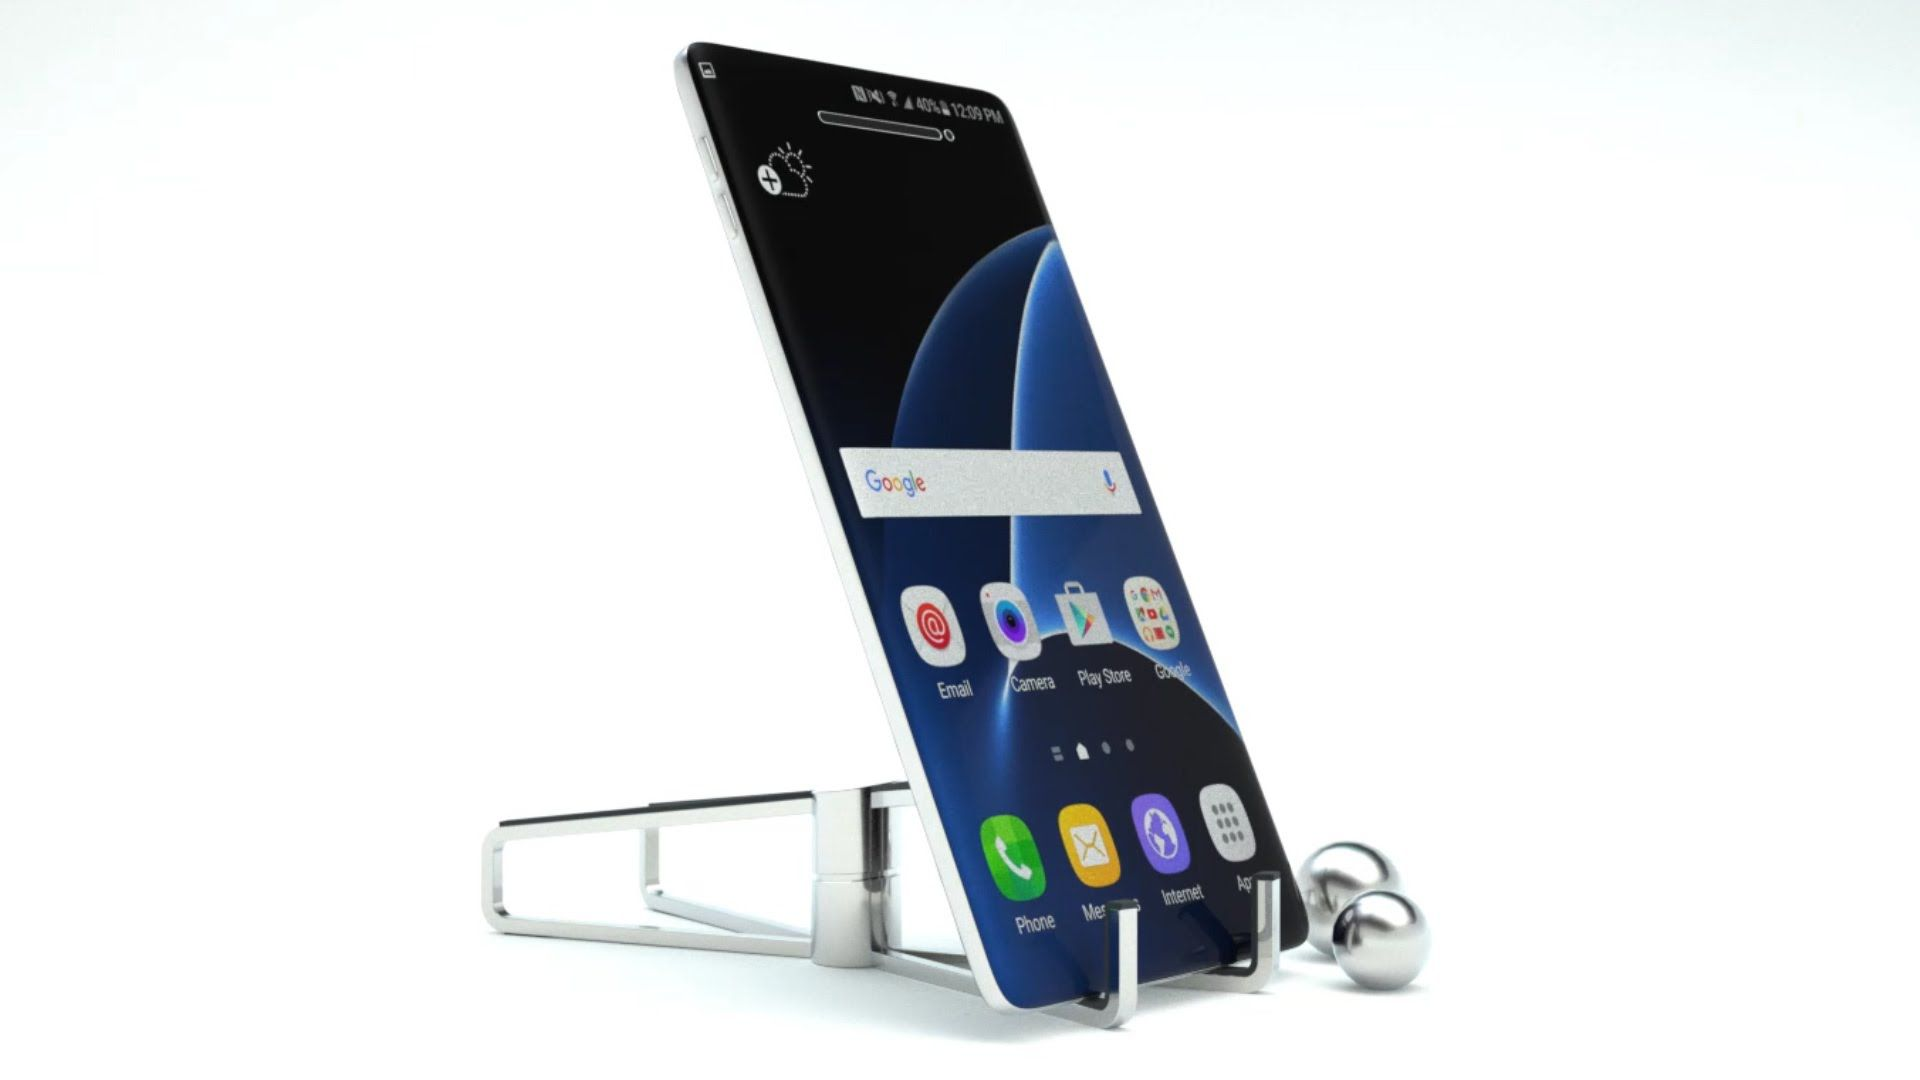 Galaxy S7 esplode in Canada, Samsung sta indagando